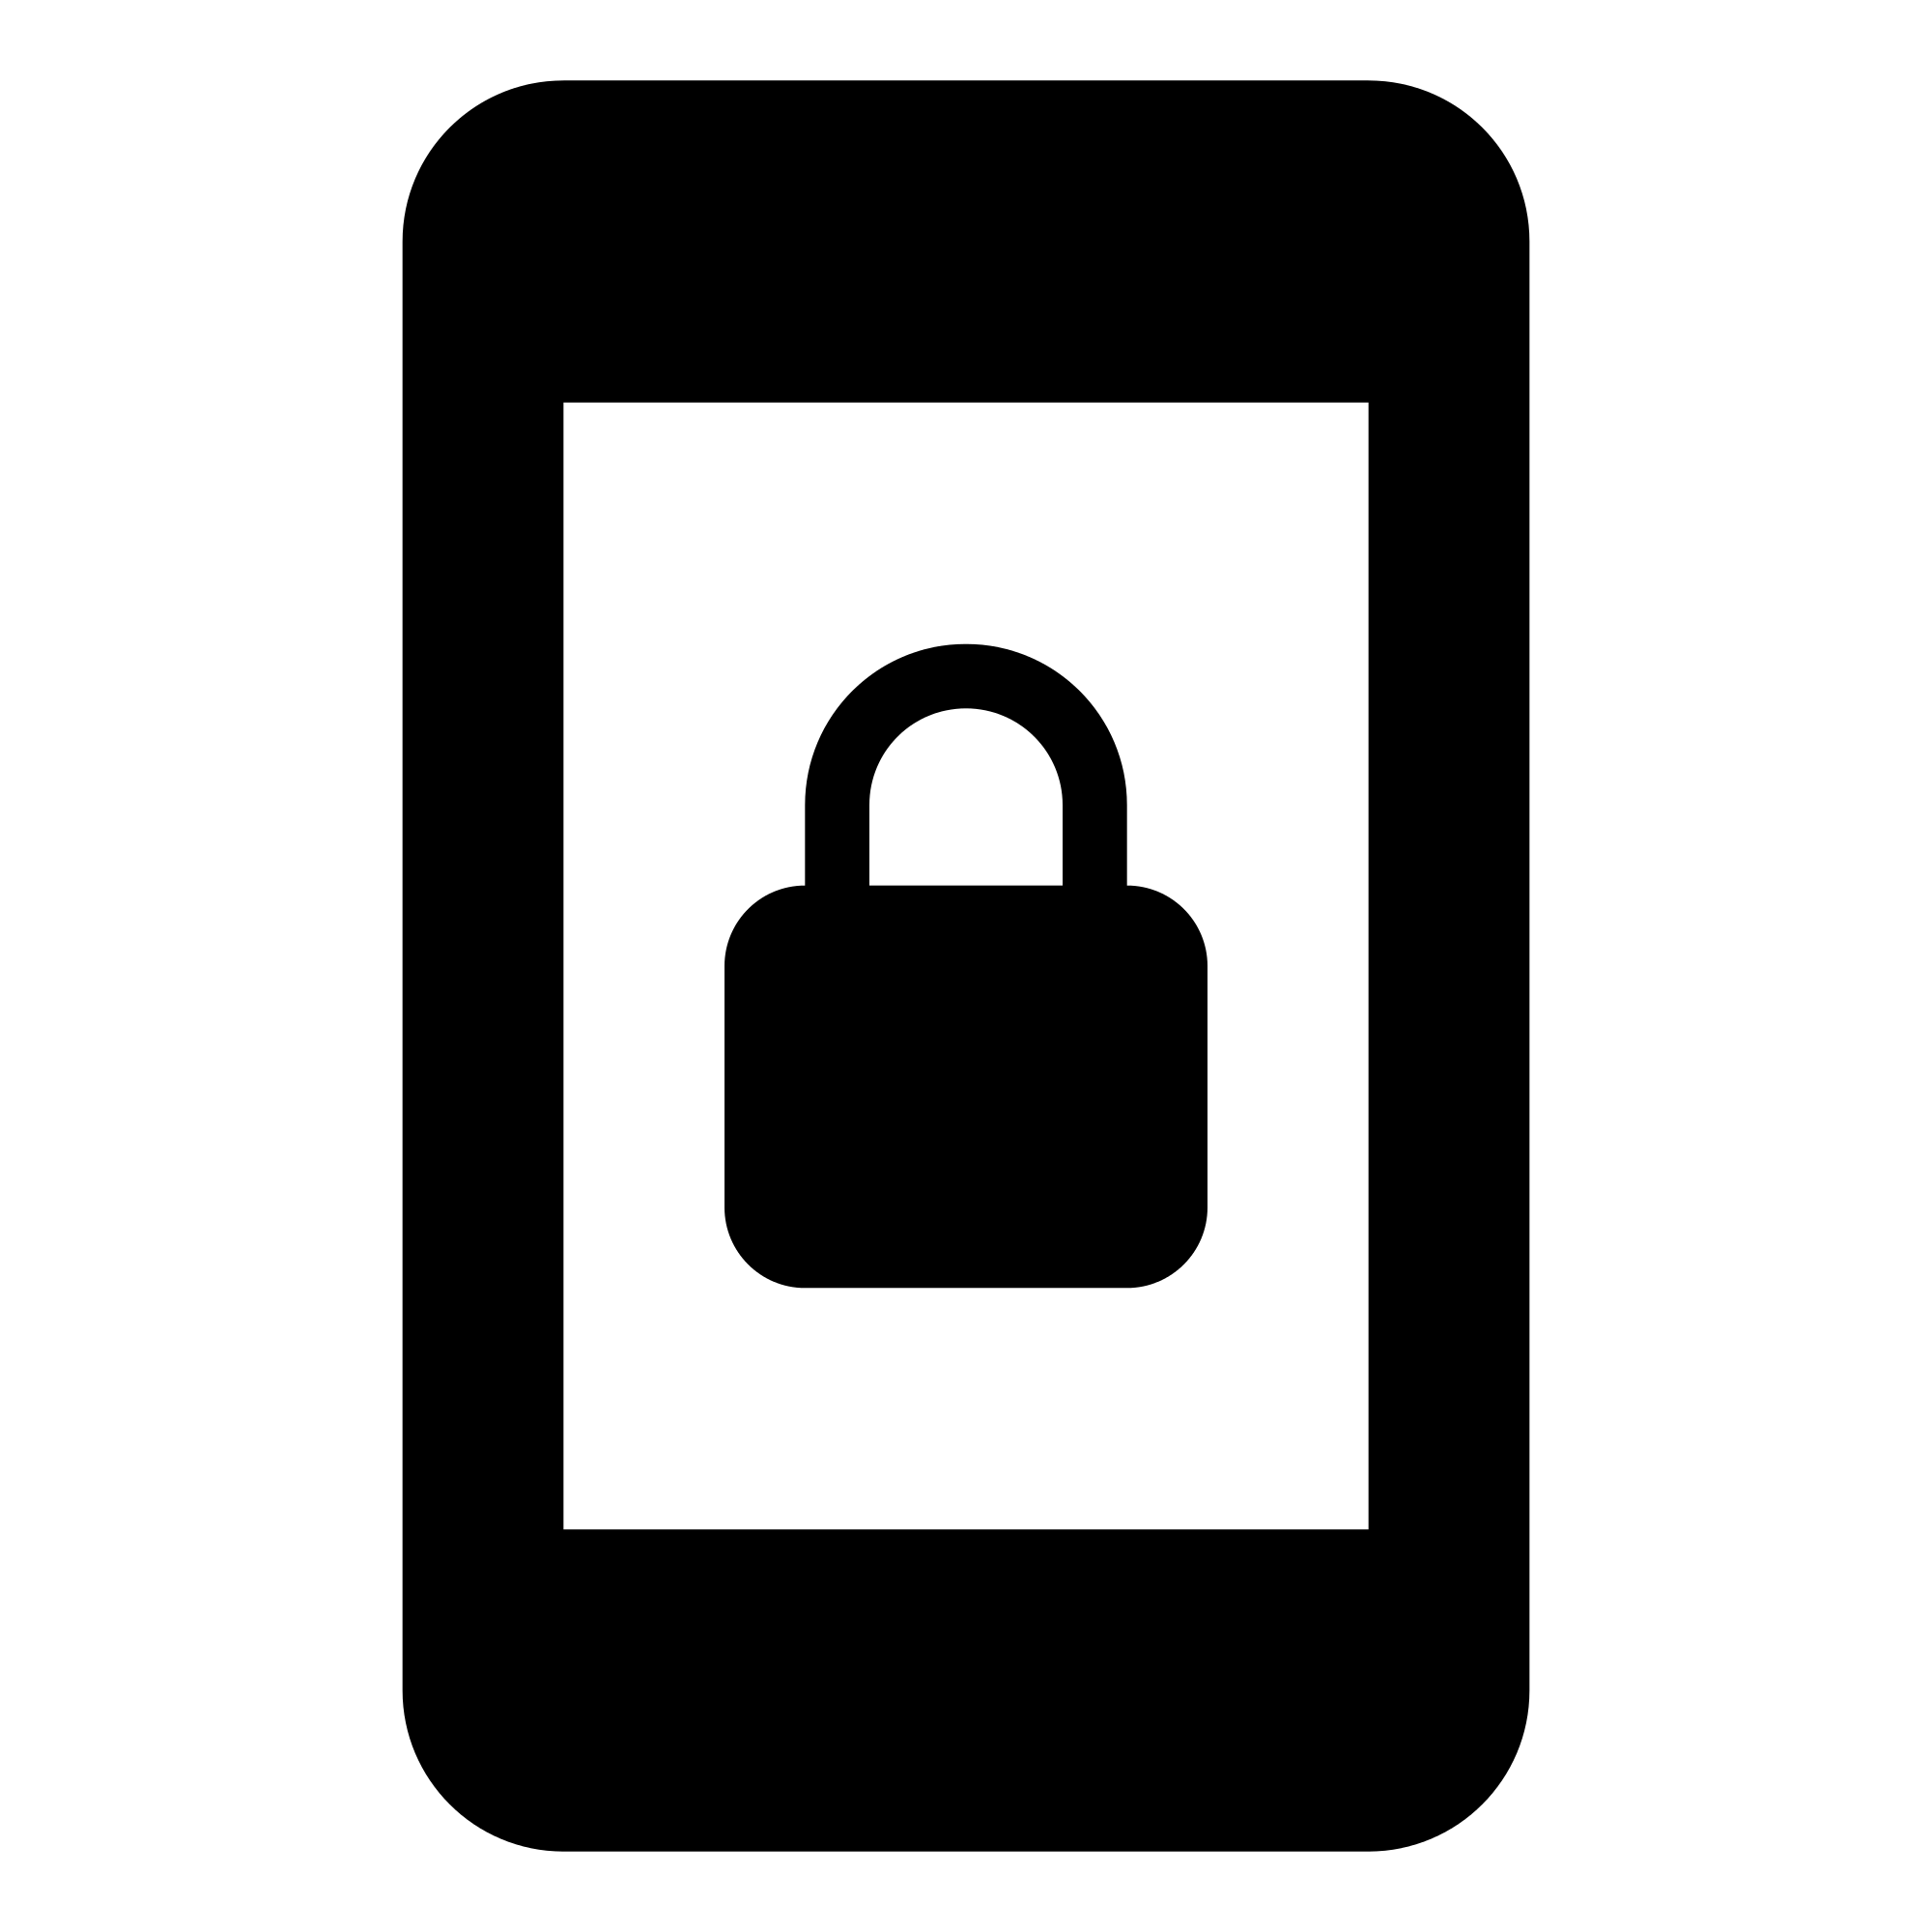 Lock clipart svg. File ic screen portrait